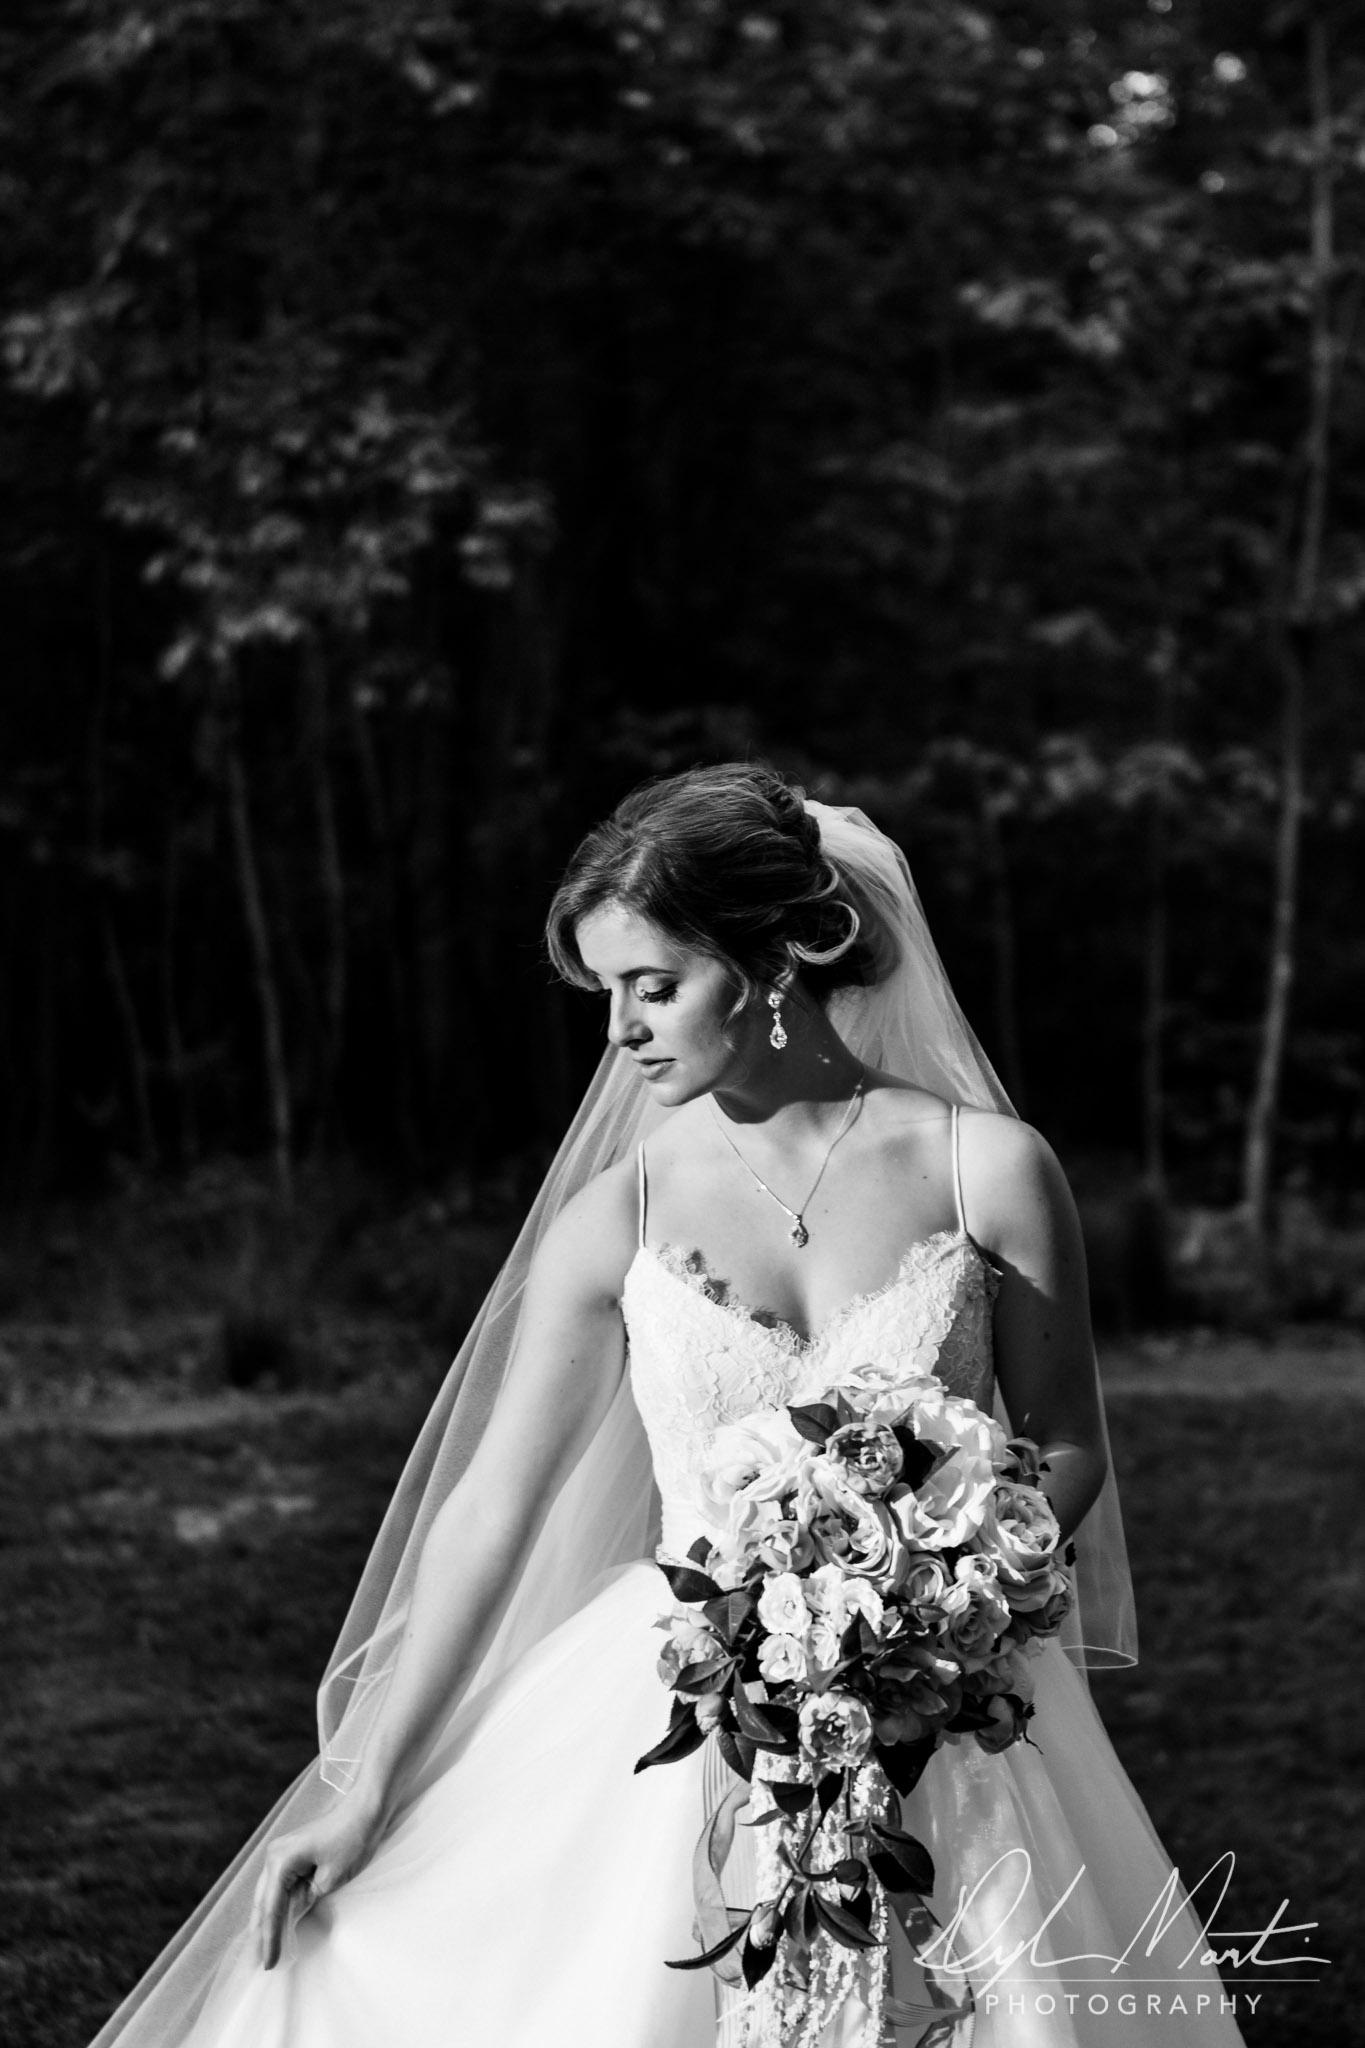 Dylan Martin Photography